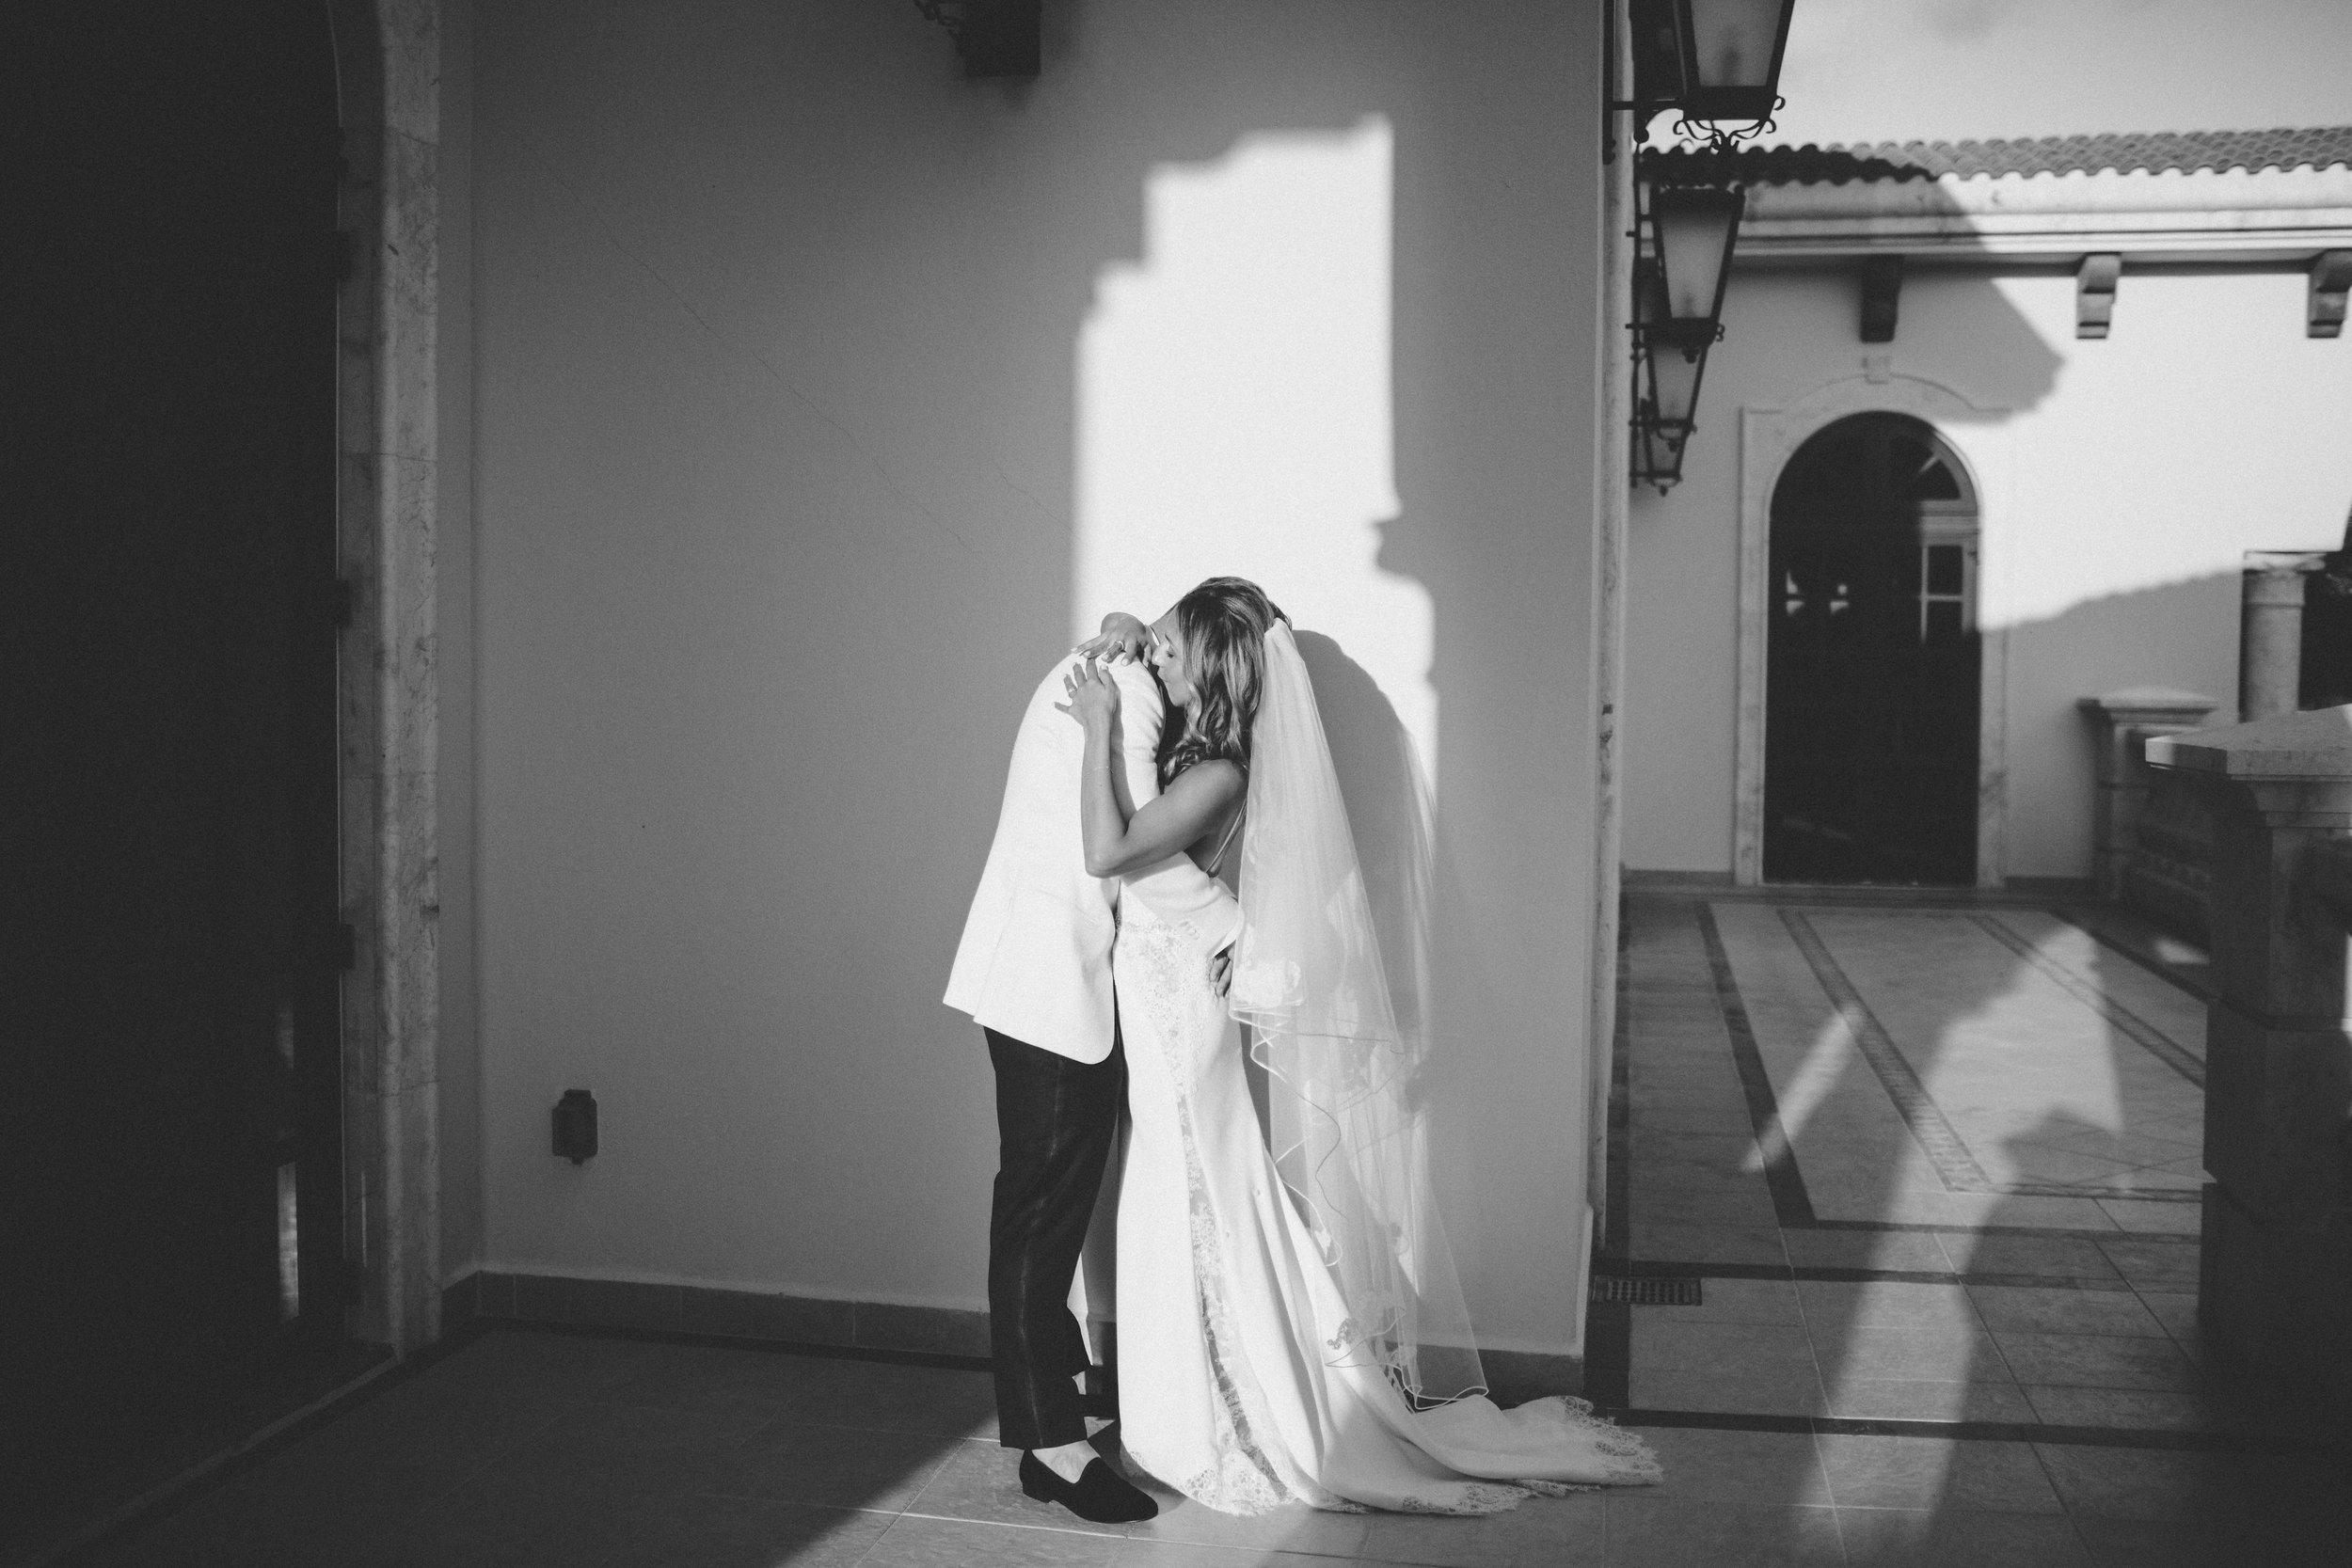 mexico_wedding_cancun_villa_la_joya_evangeline_lane_095.jpg